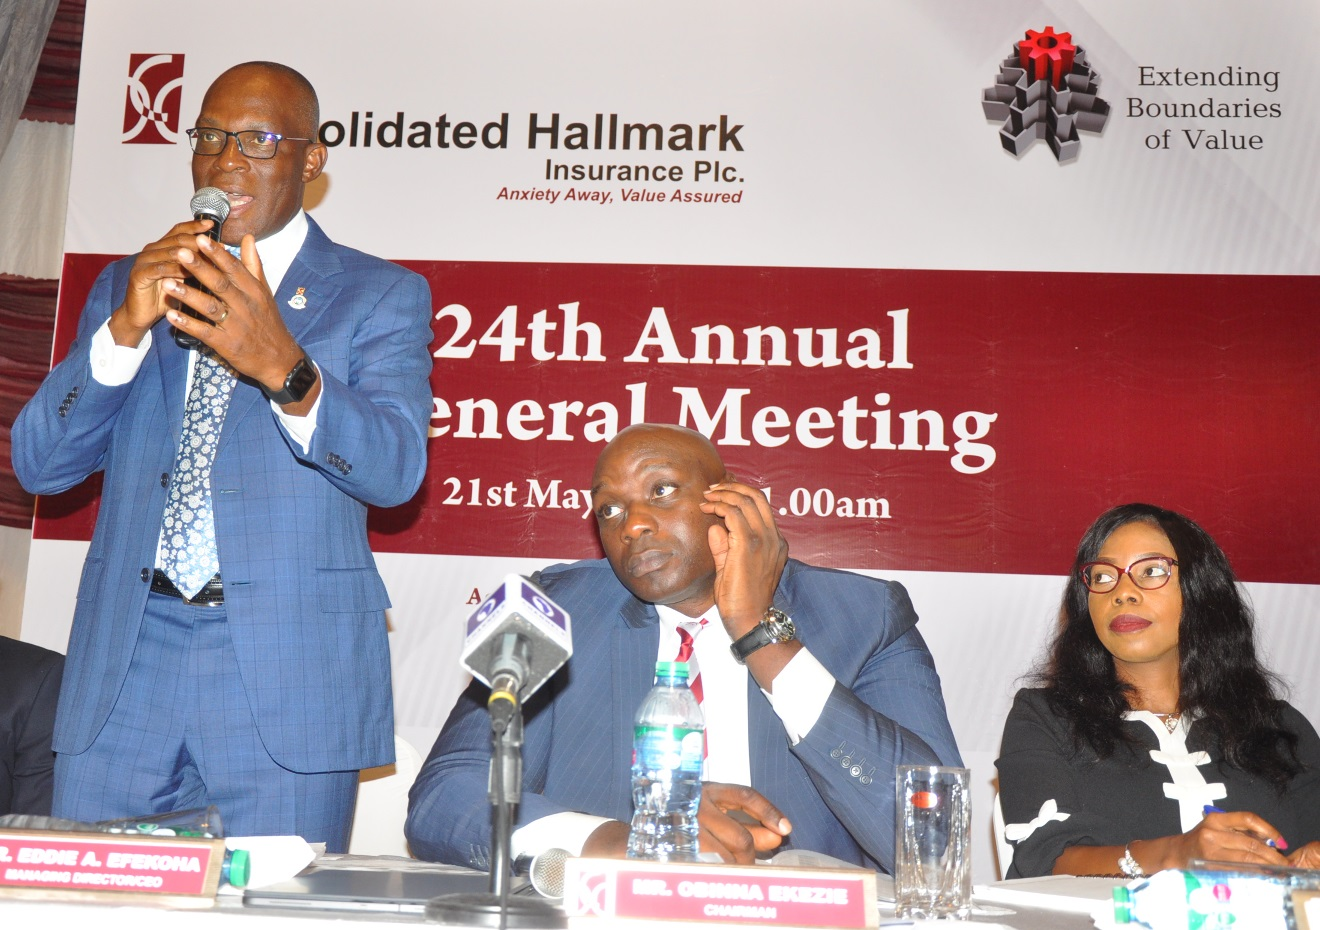 L-R: Mr. Eddie Efekoha, Managing Director/CEO, Consolidated Hallmark Insurance (CHI) Plc; Mr. Obinna Ekezie, Chairman Board and Mrs. Rukevwe Falana, Company Secretary/Legal Adviser